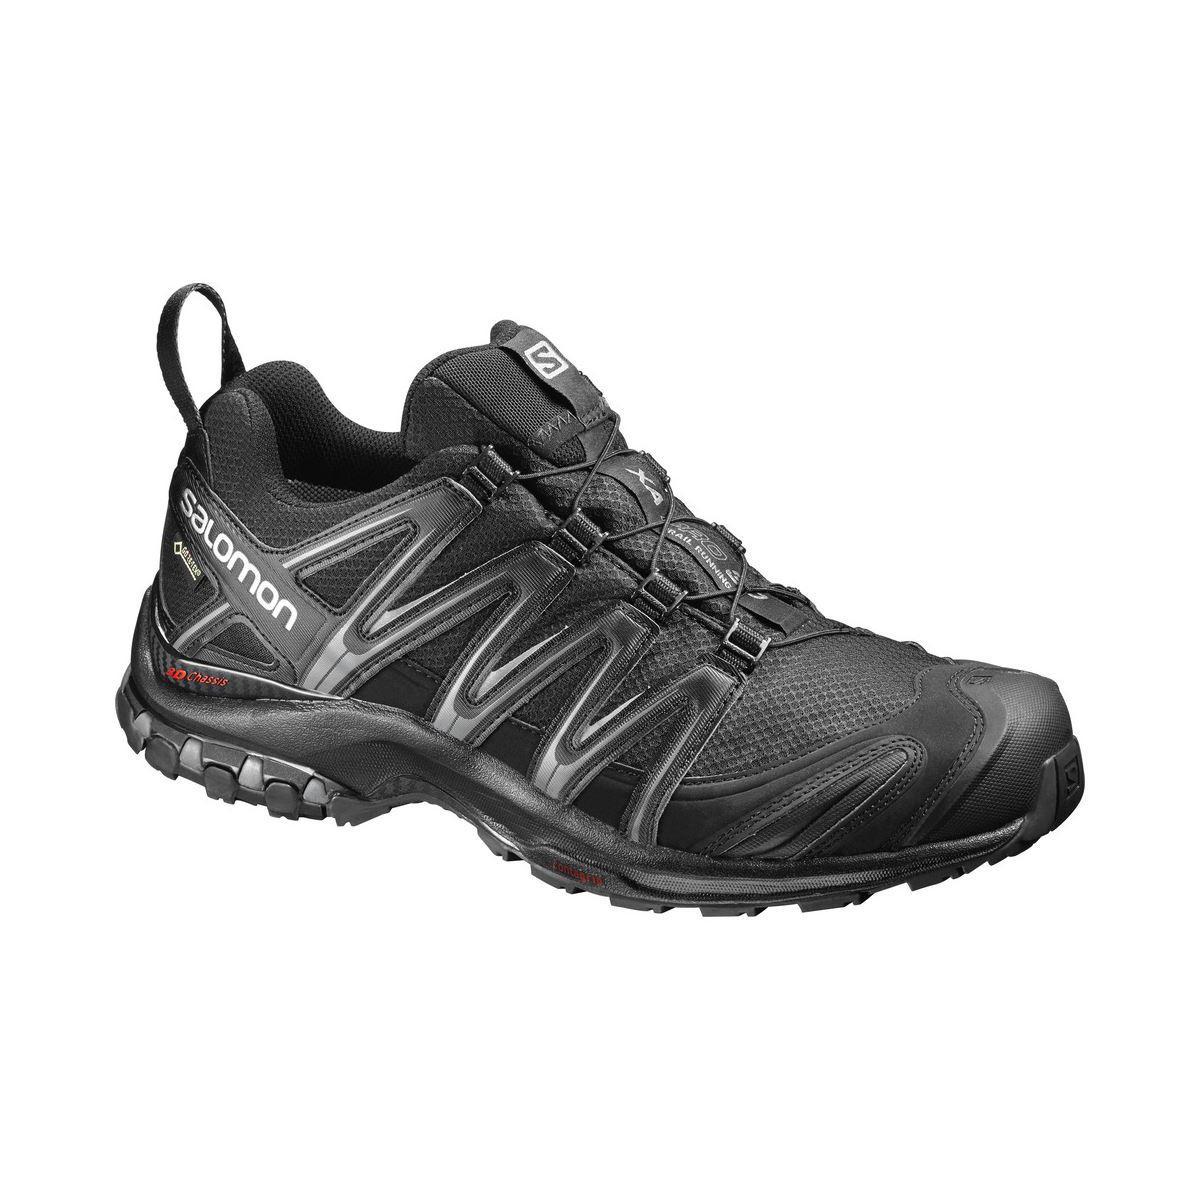 Salomon Xa Pro 3D Goretex  Ayakkabı